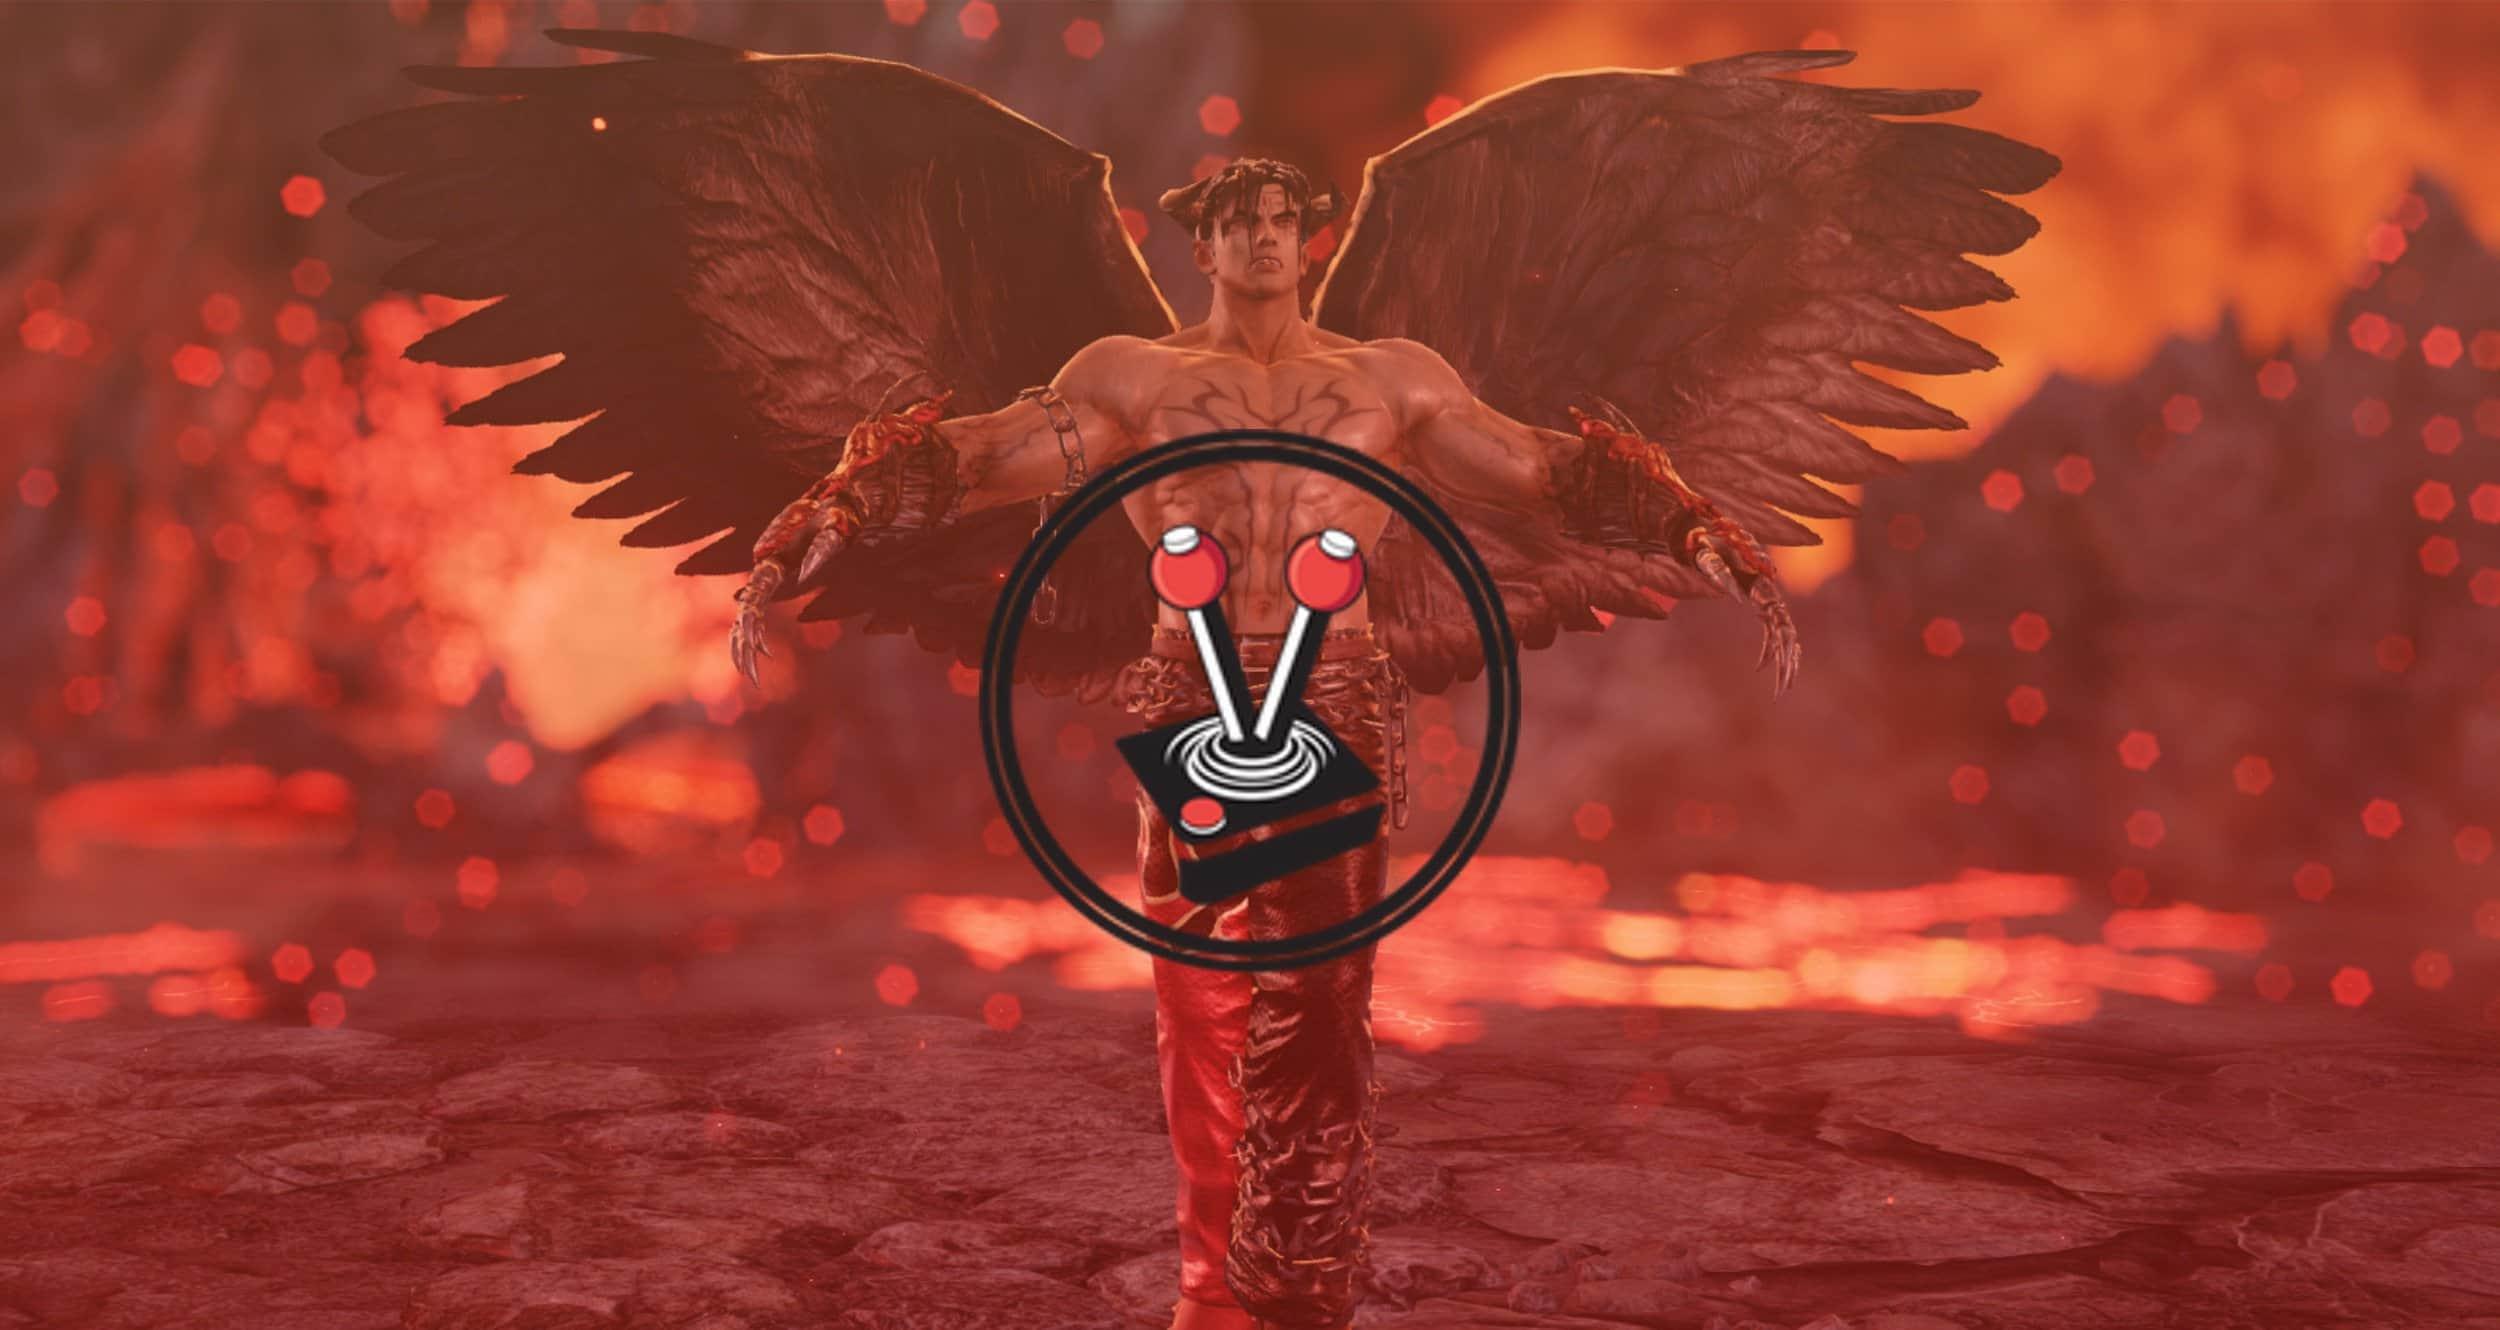 Tekken 7 (2017) is good, but bland [REVIEW] | Vamers